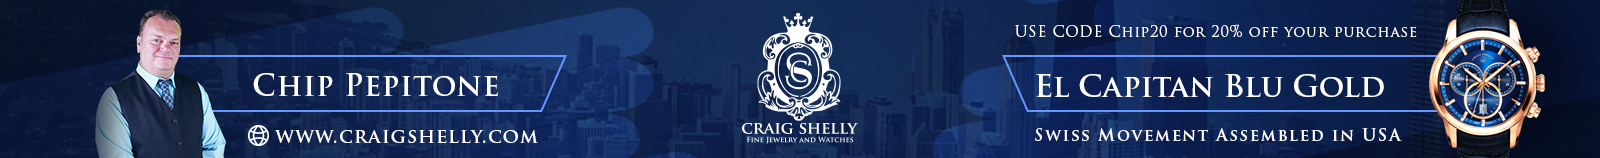 Craig-Shely-Beverly-Hills-Ambassador-Chip-Pepitone-Rotating-Banner